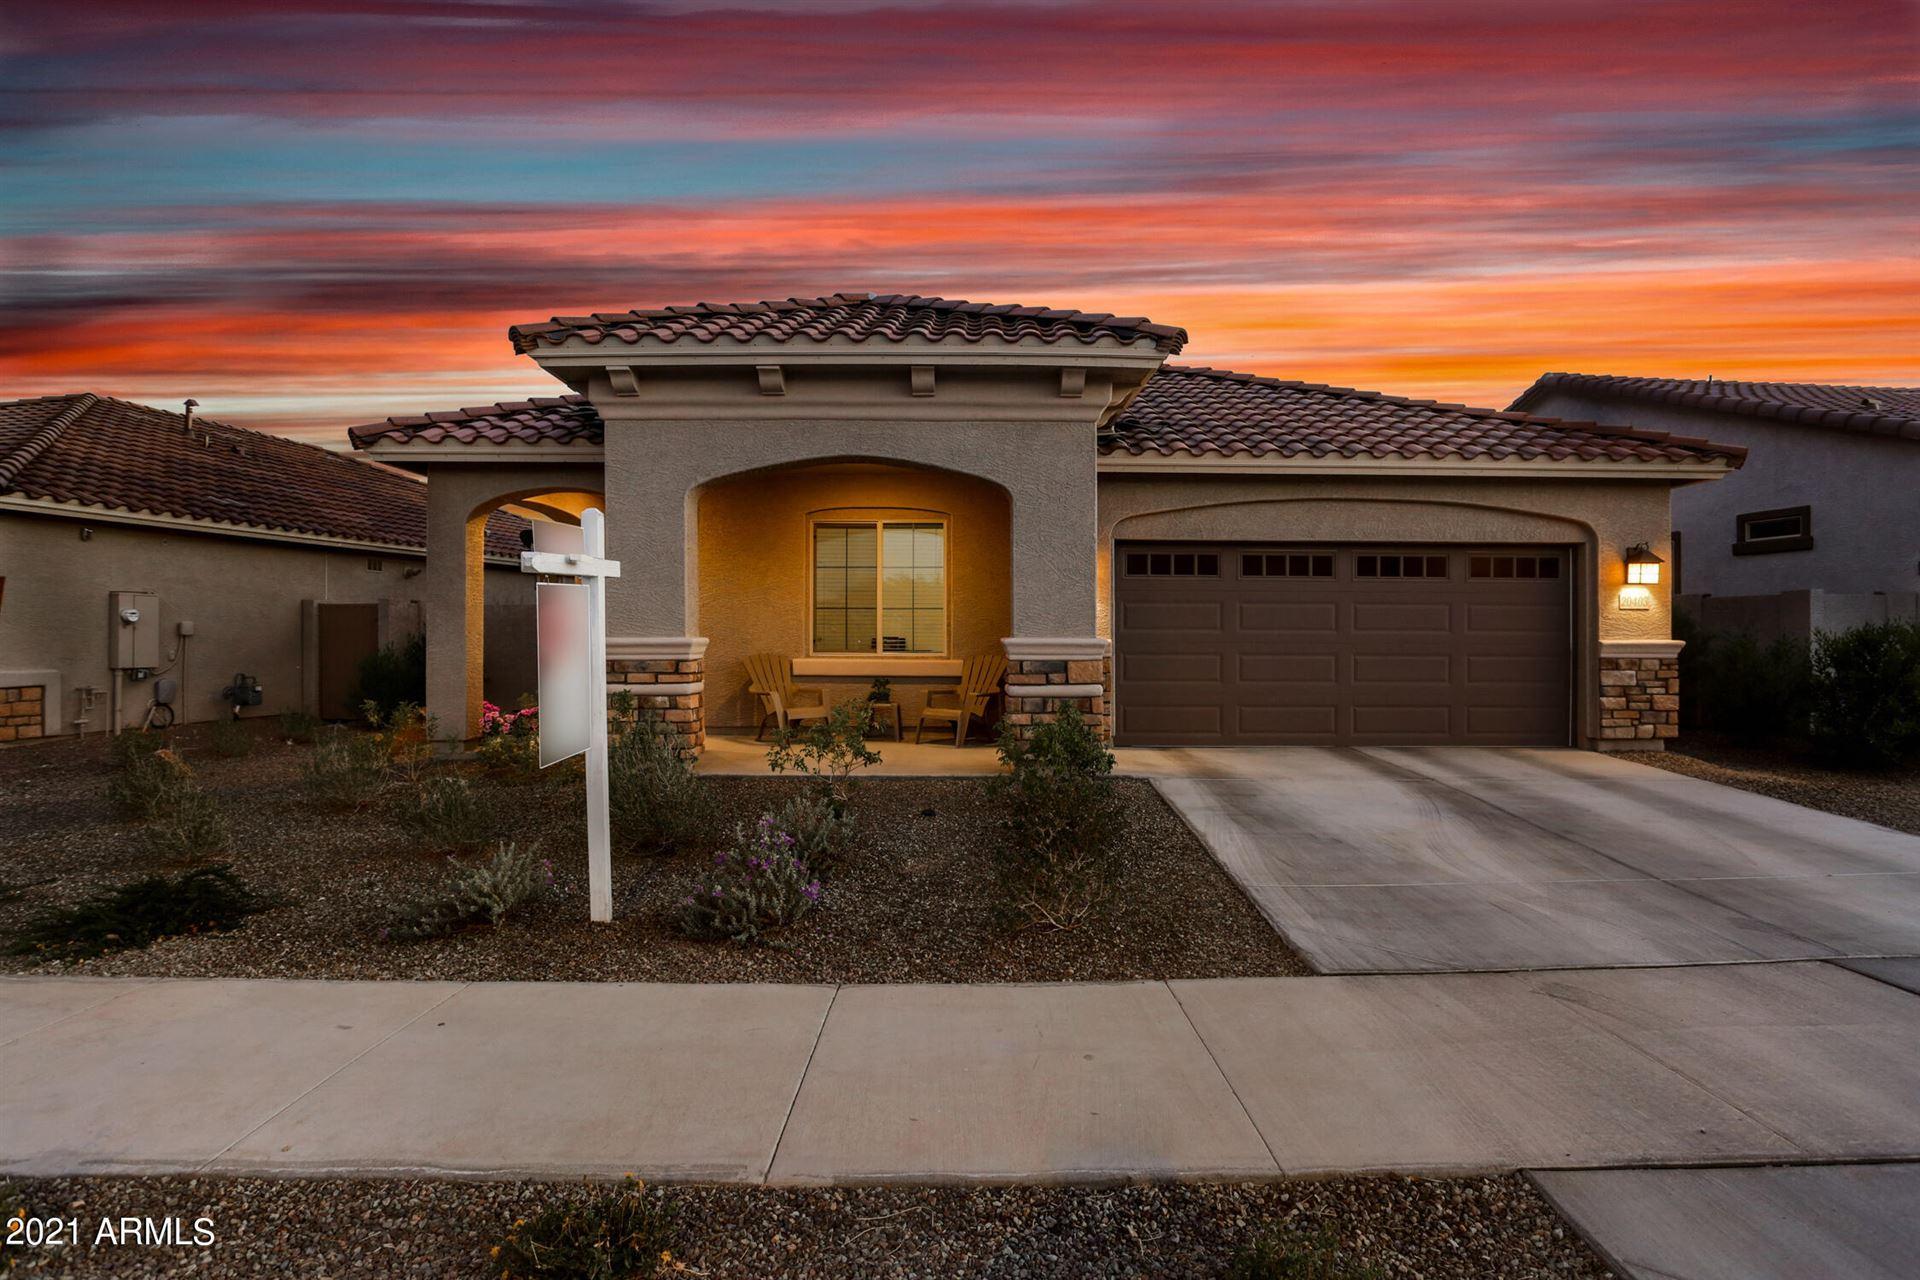 Photo of 20403 W CALLE ENCORVADA --, Buckeye, AZ 85396 (MLS # 6202123)